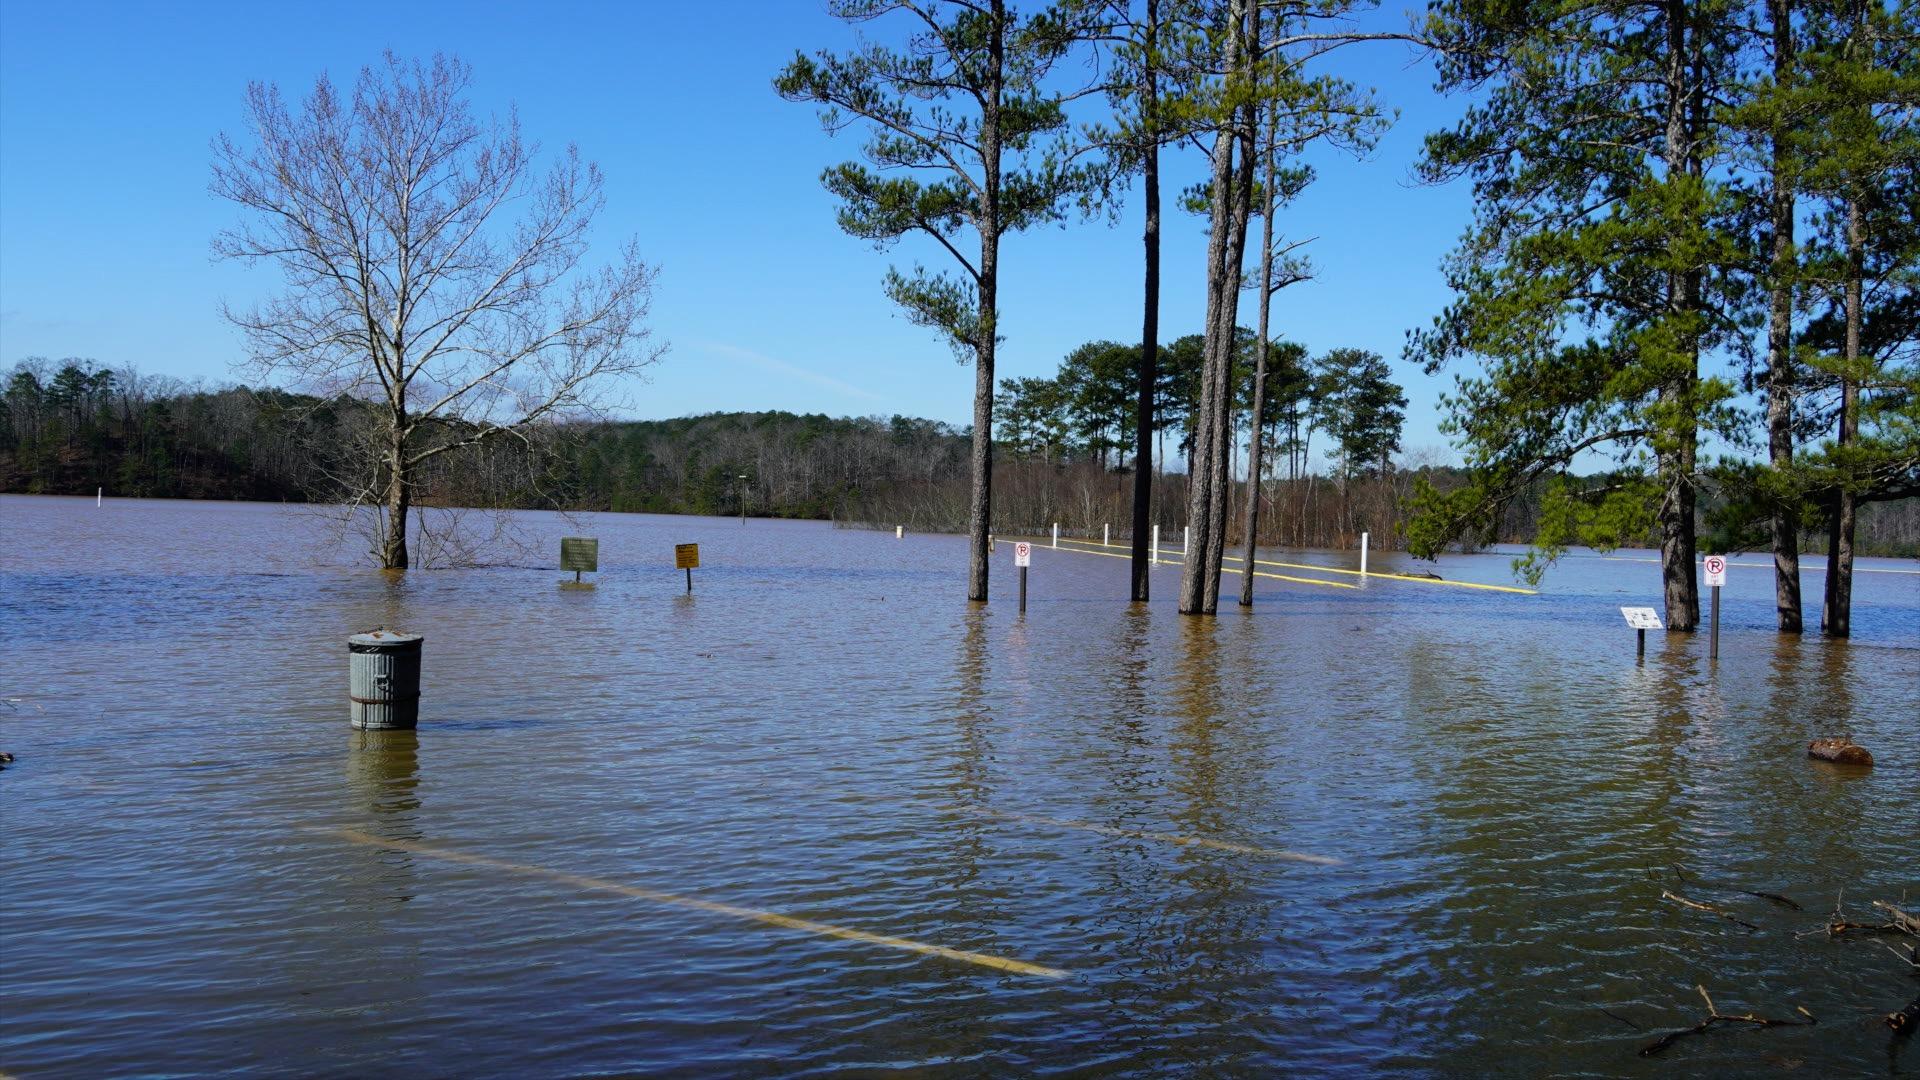 Lake altoona flooding